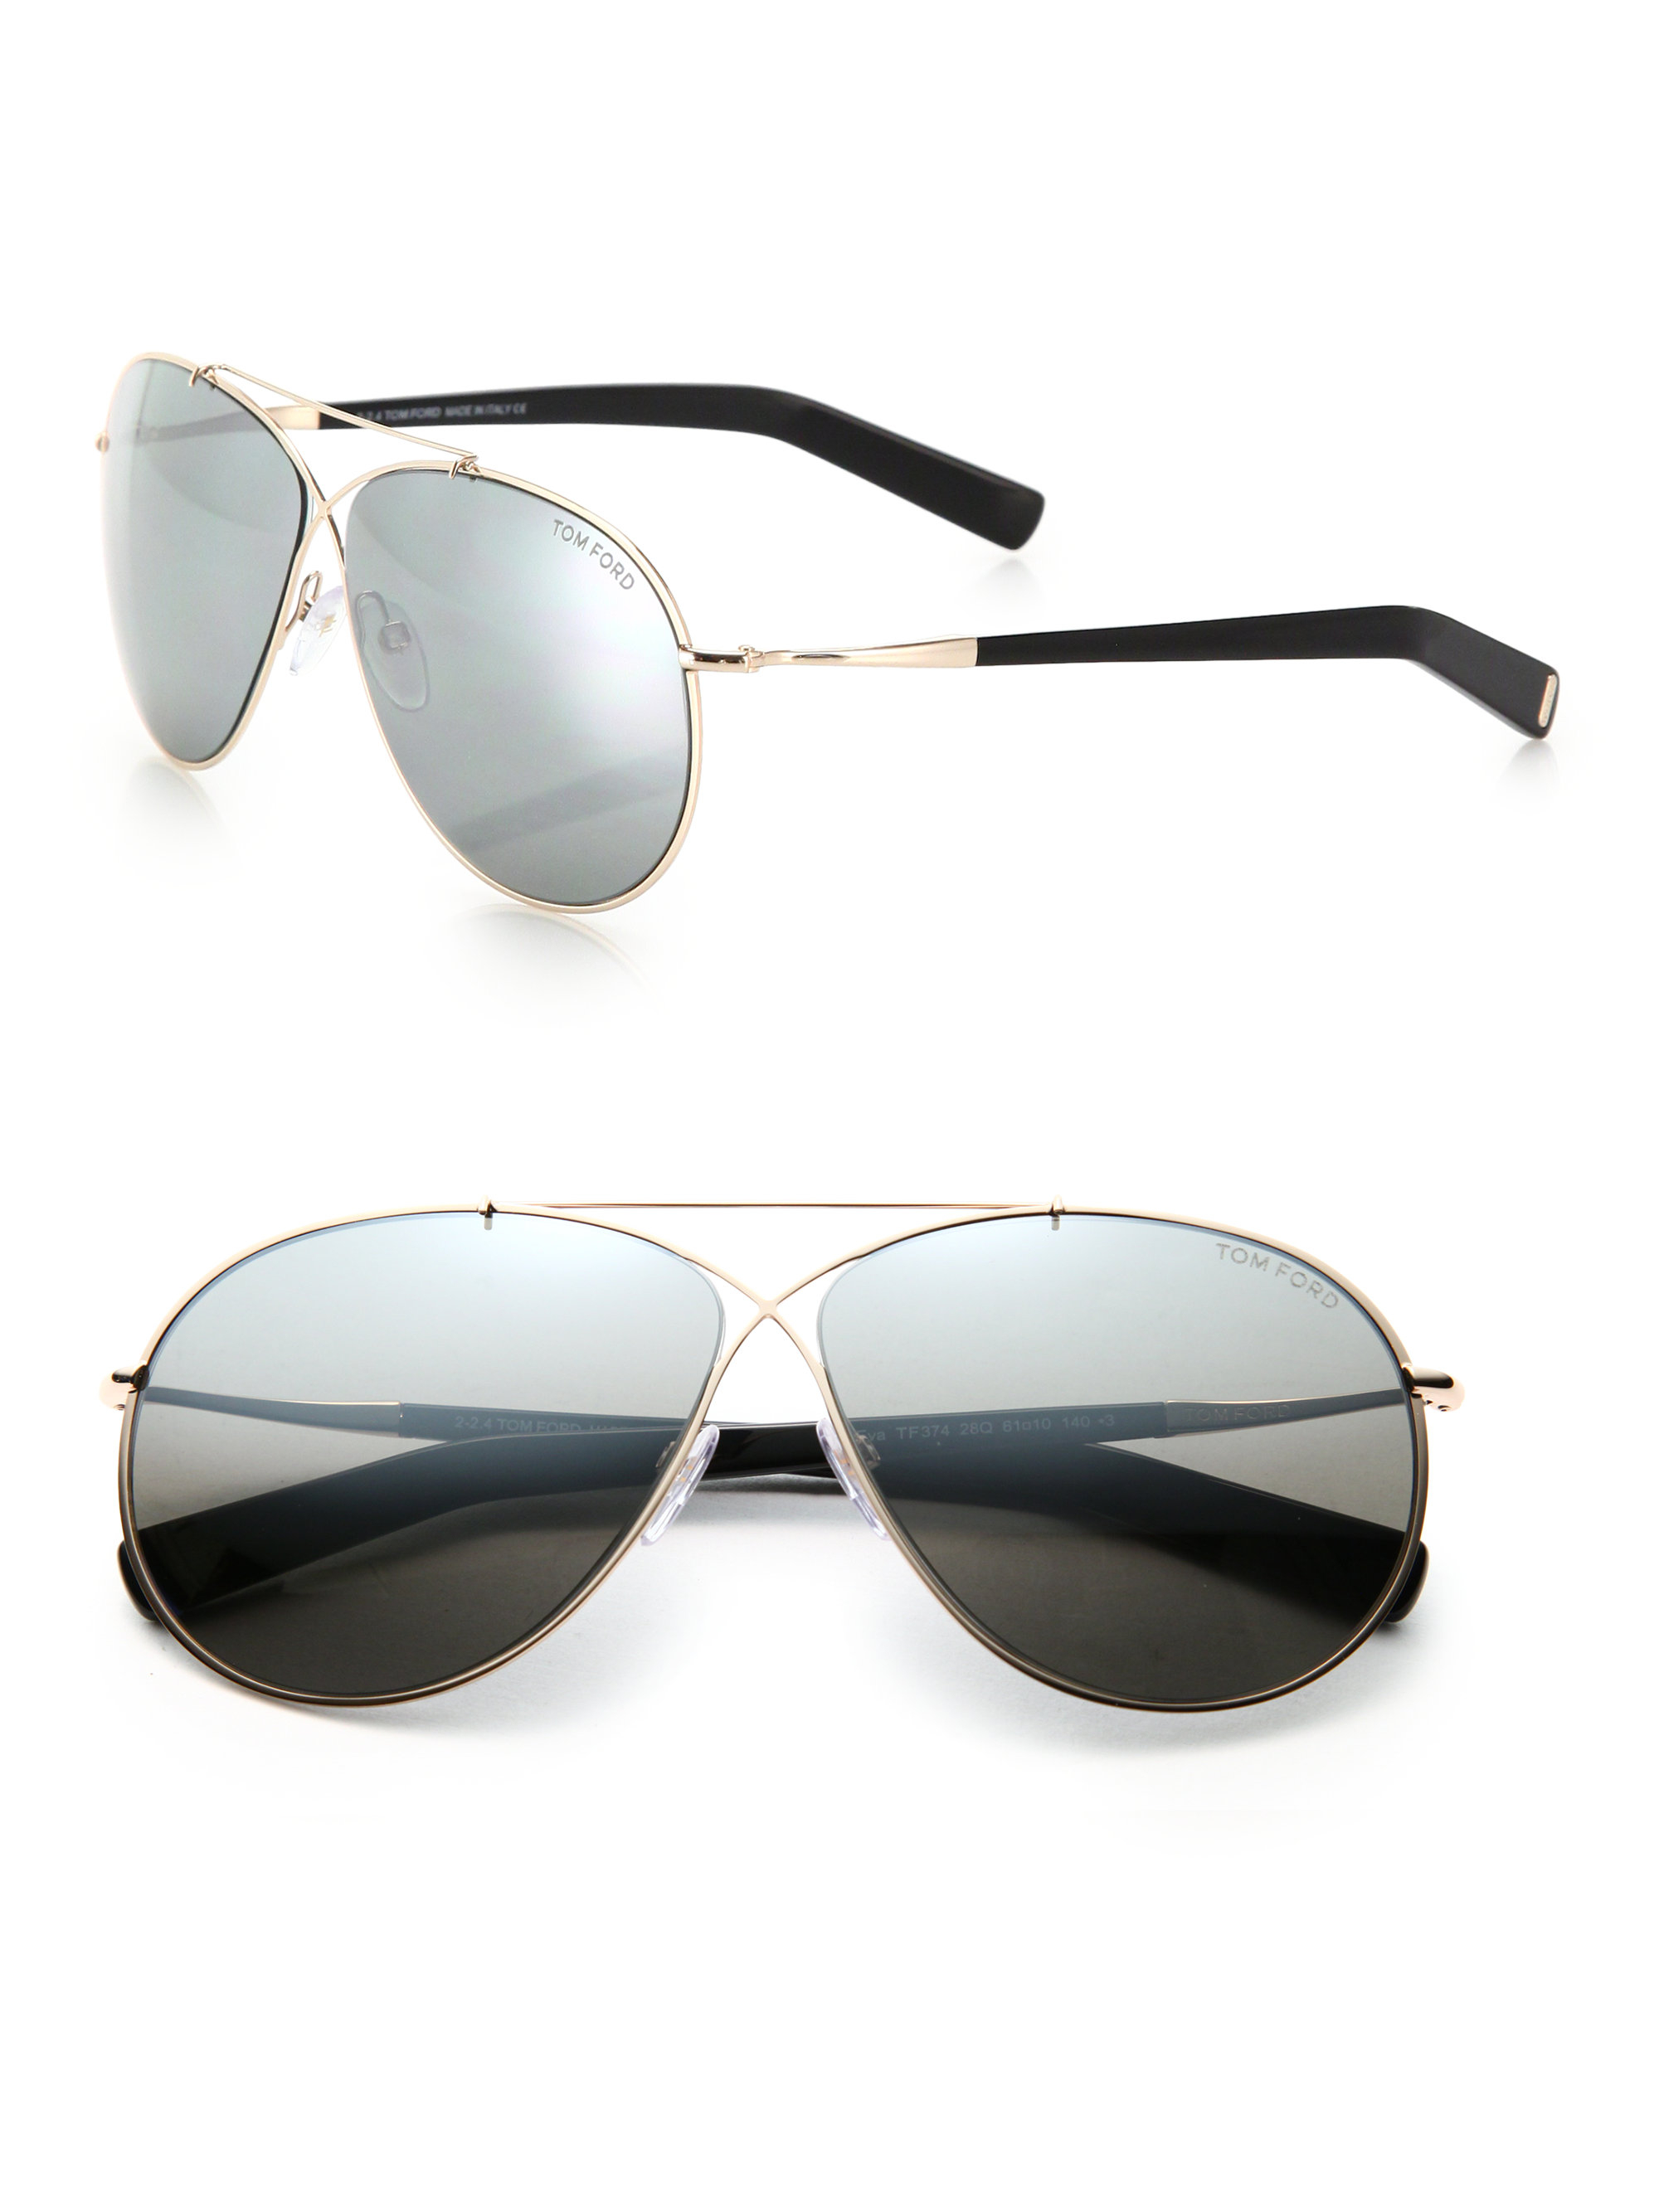 aa1b36eee122 Lyst - Tom Ford Eva 61mm Pilot Sunglasses in Metallic